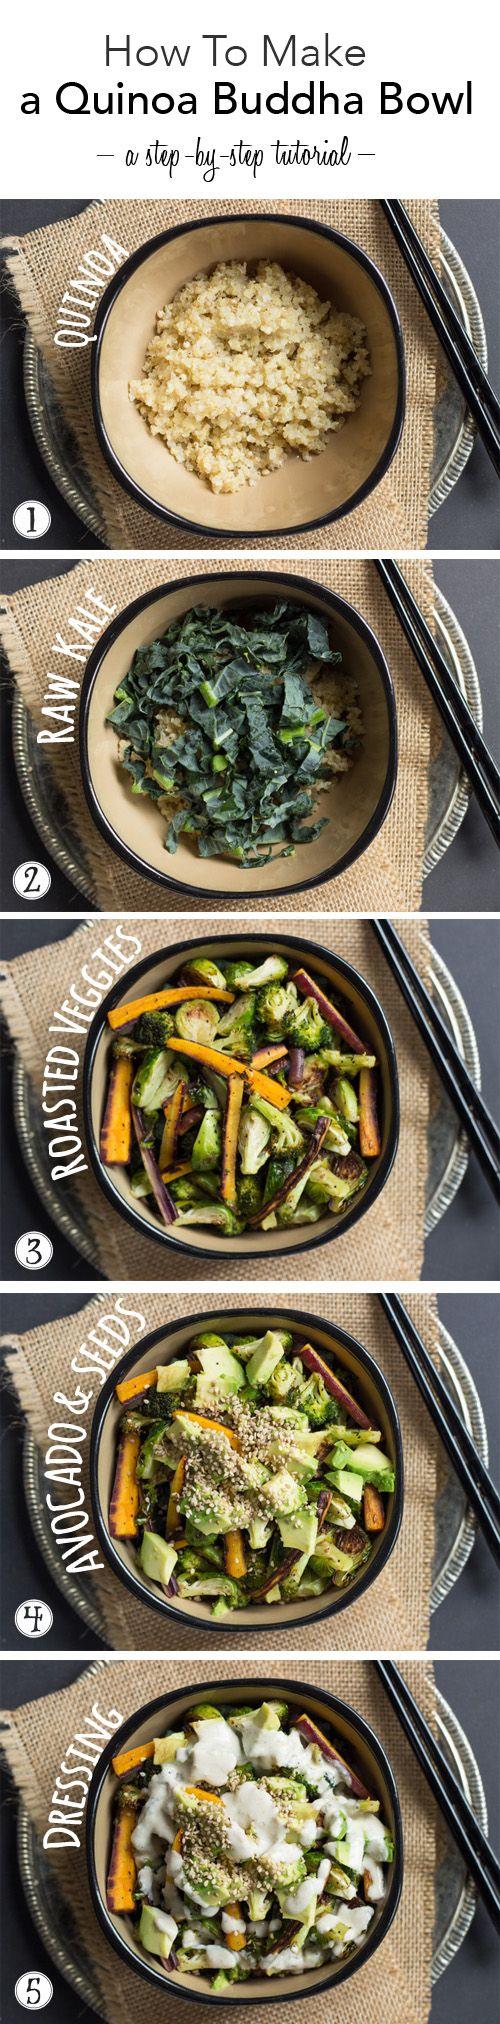 Quinoa Buddha Bowl Recipe [tutorial post]